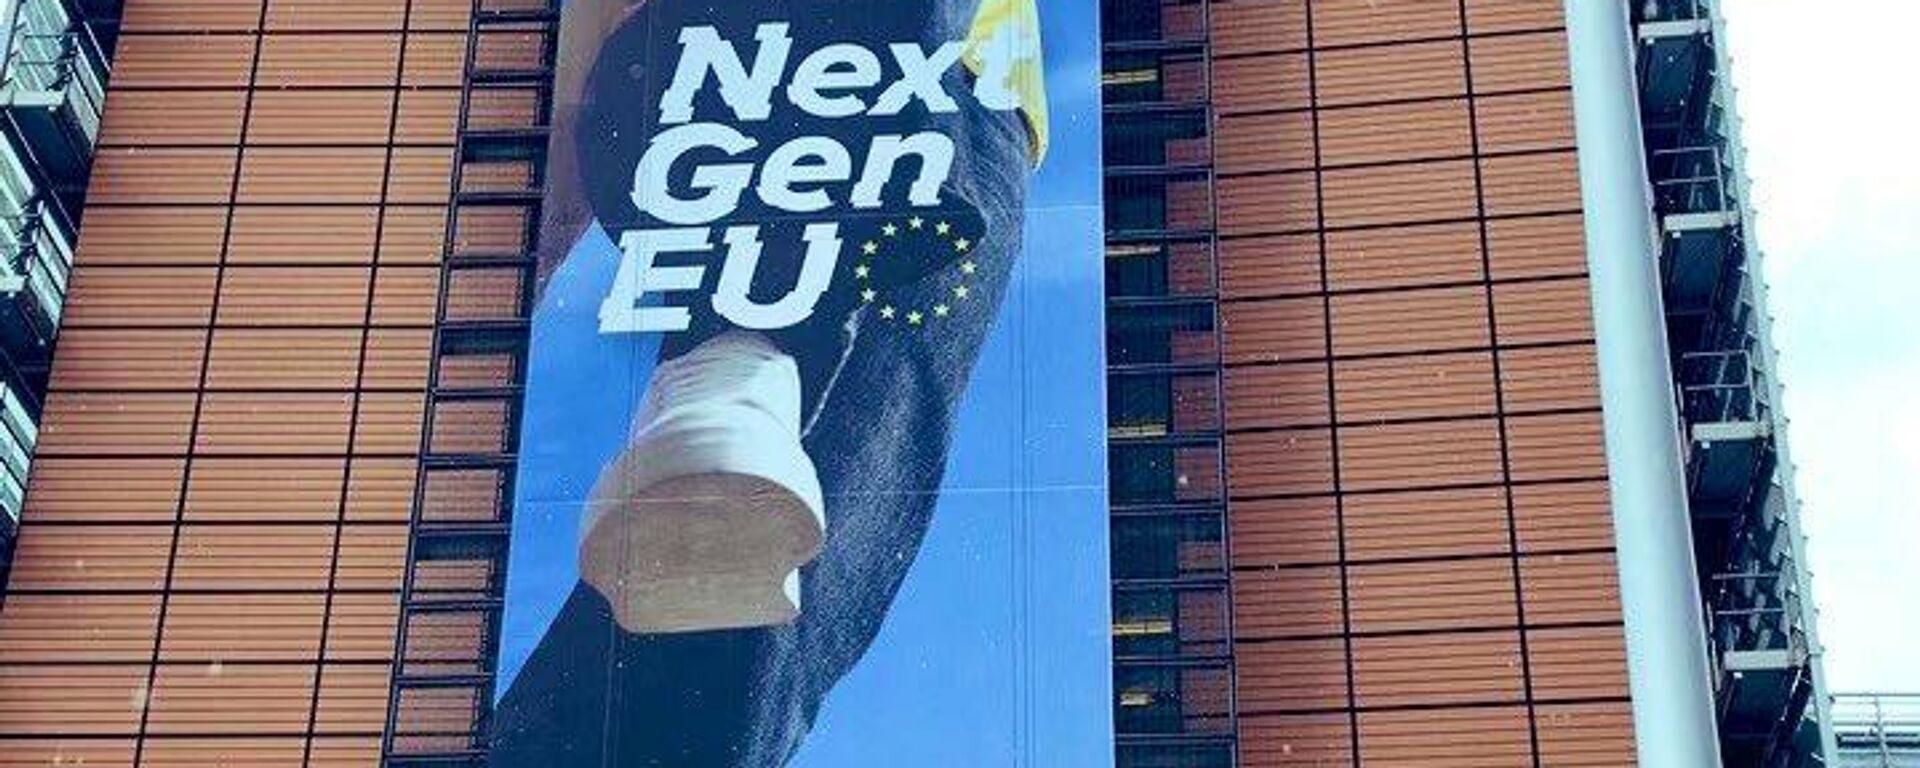 Next Generation Eu - Sputnik Italia, 1920, 28.05.2021